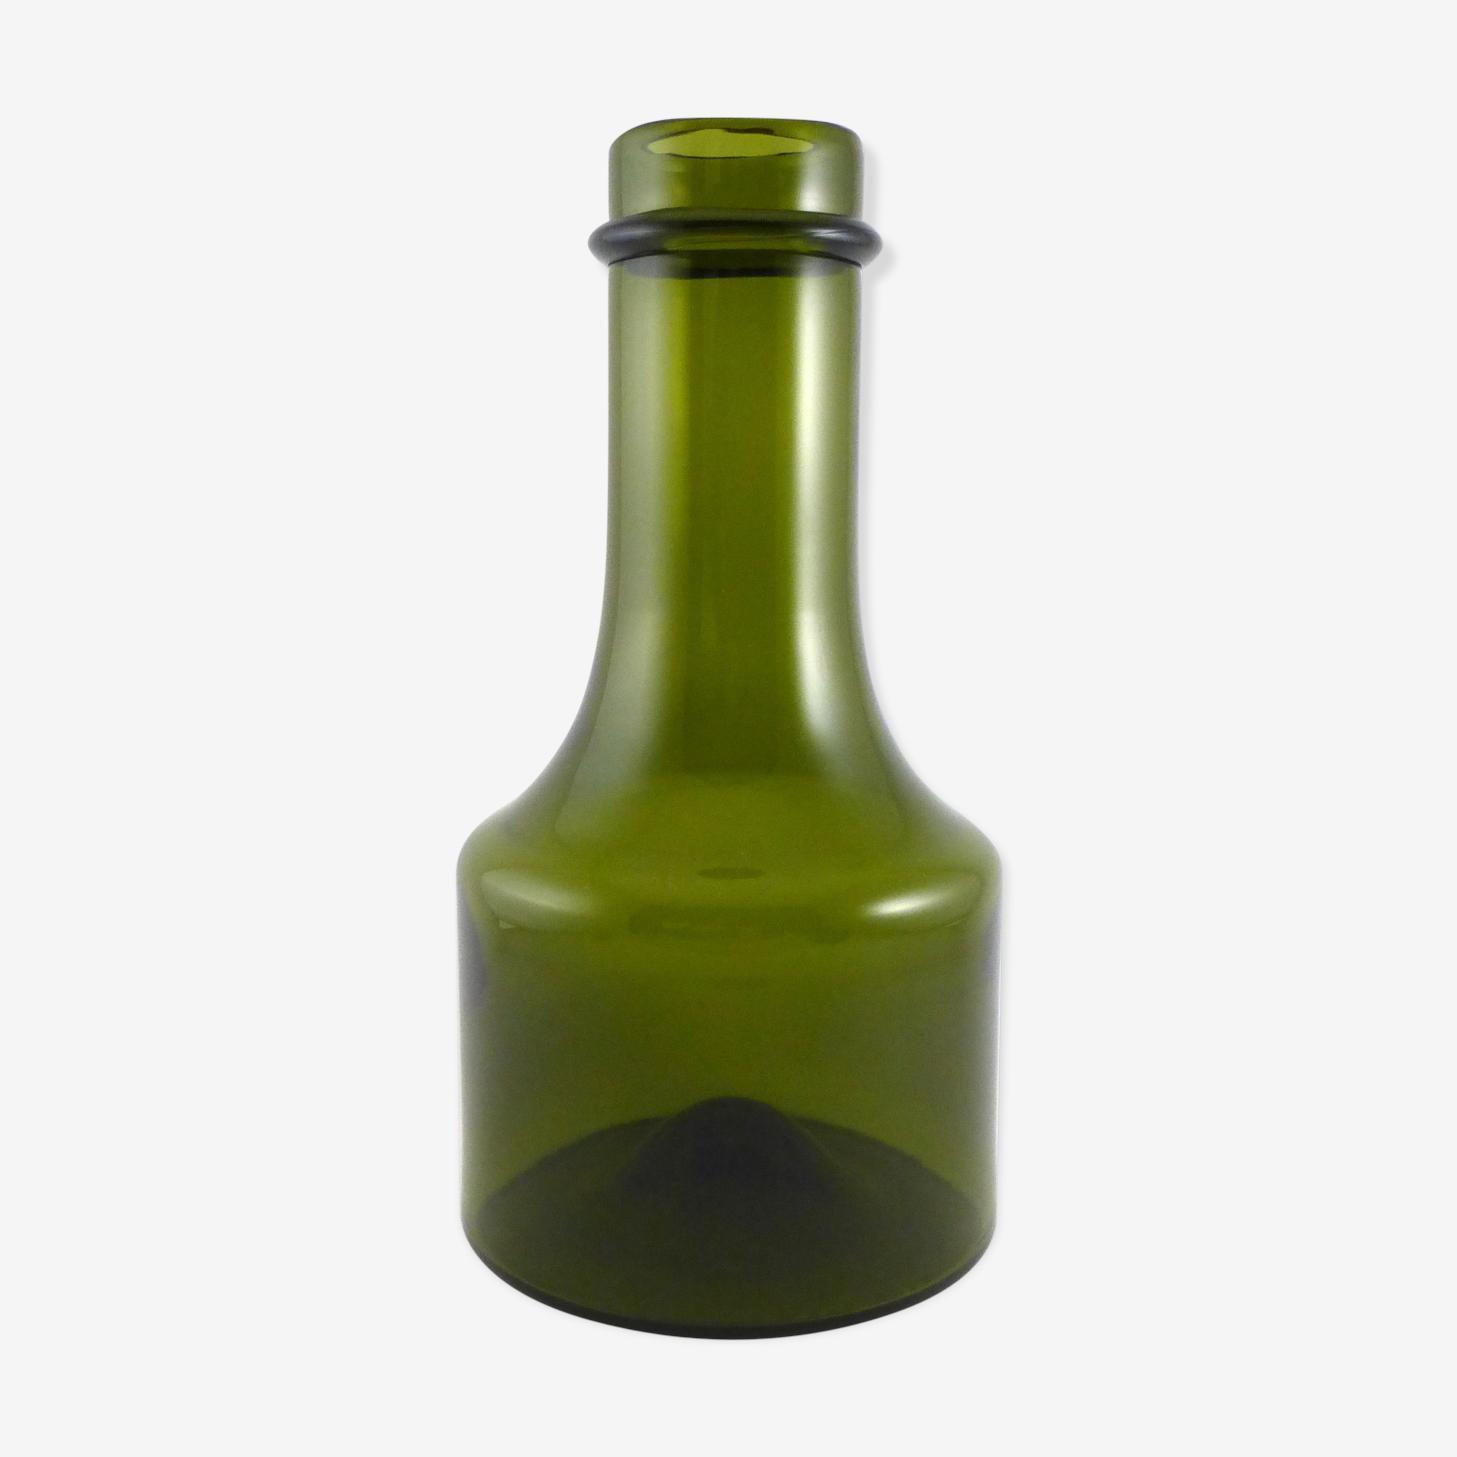 Tapio Wirkkala Glass Vase for Ittala House (Finland), 1959-1968